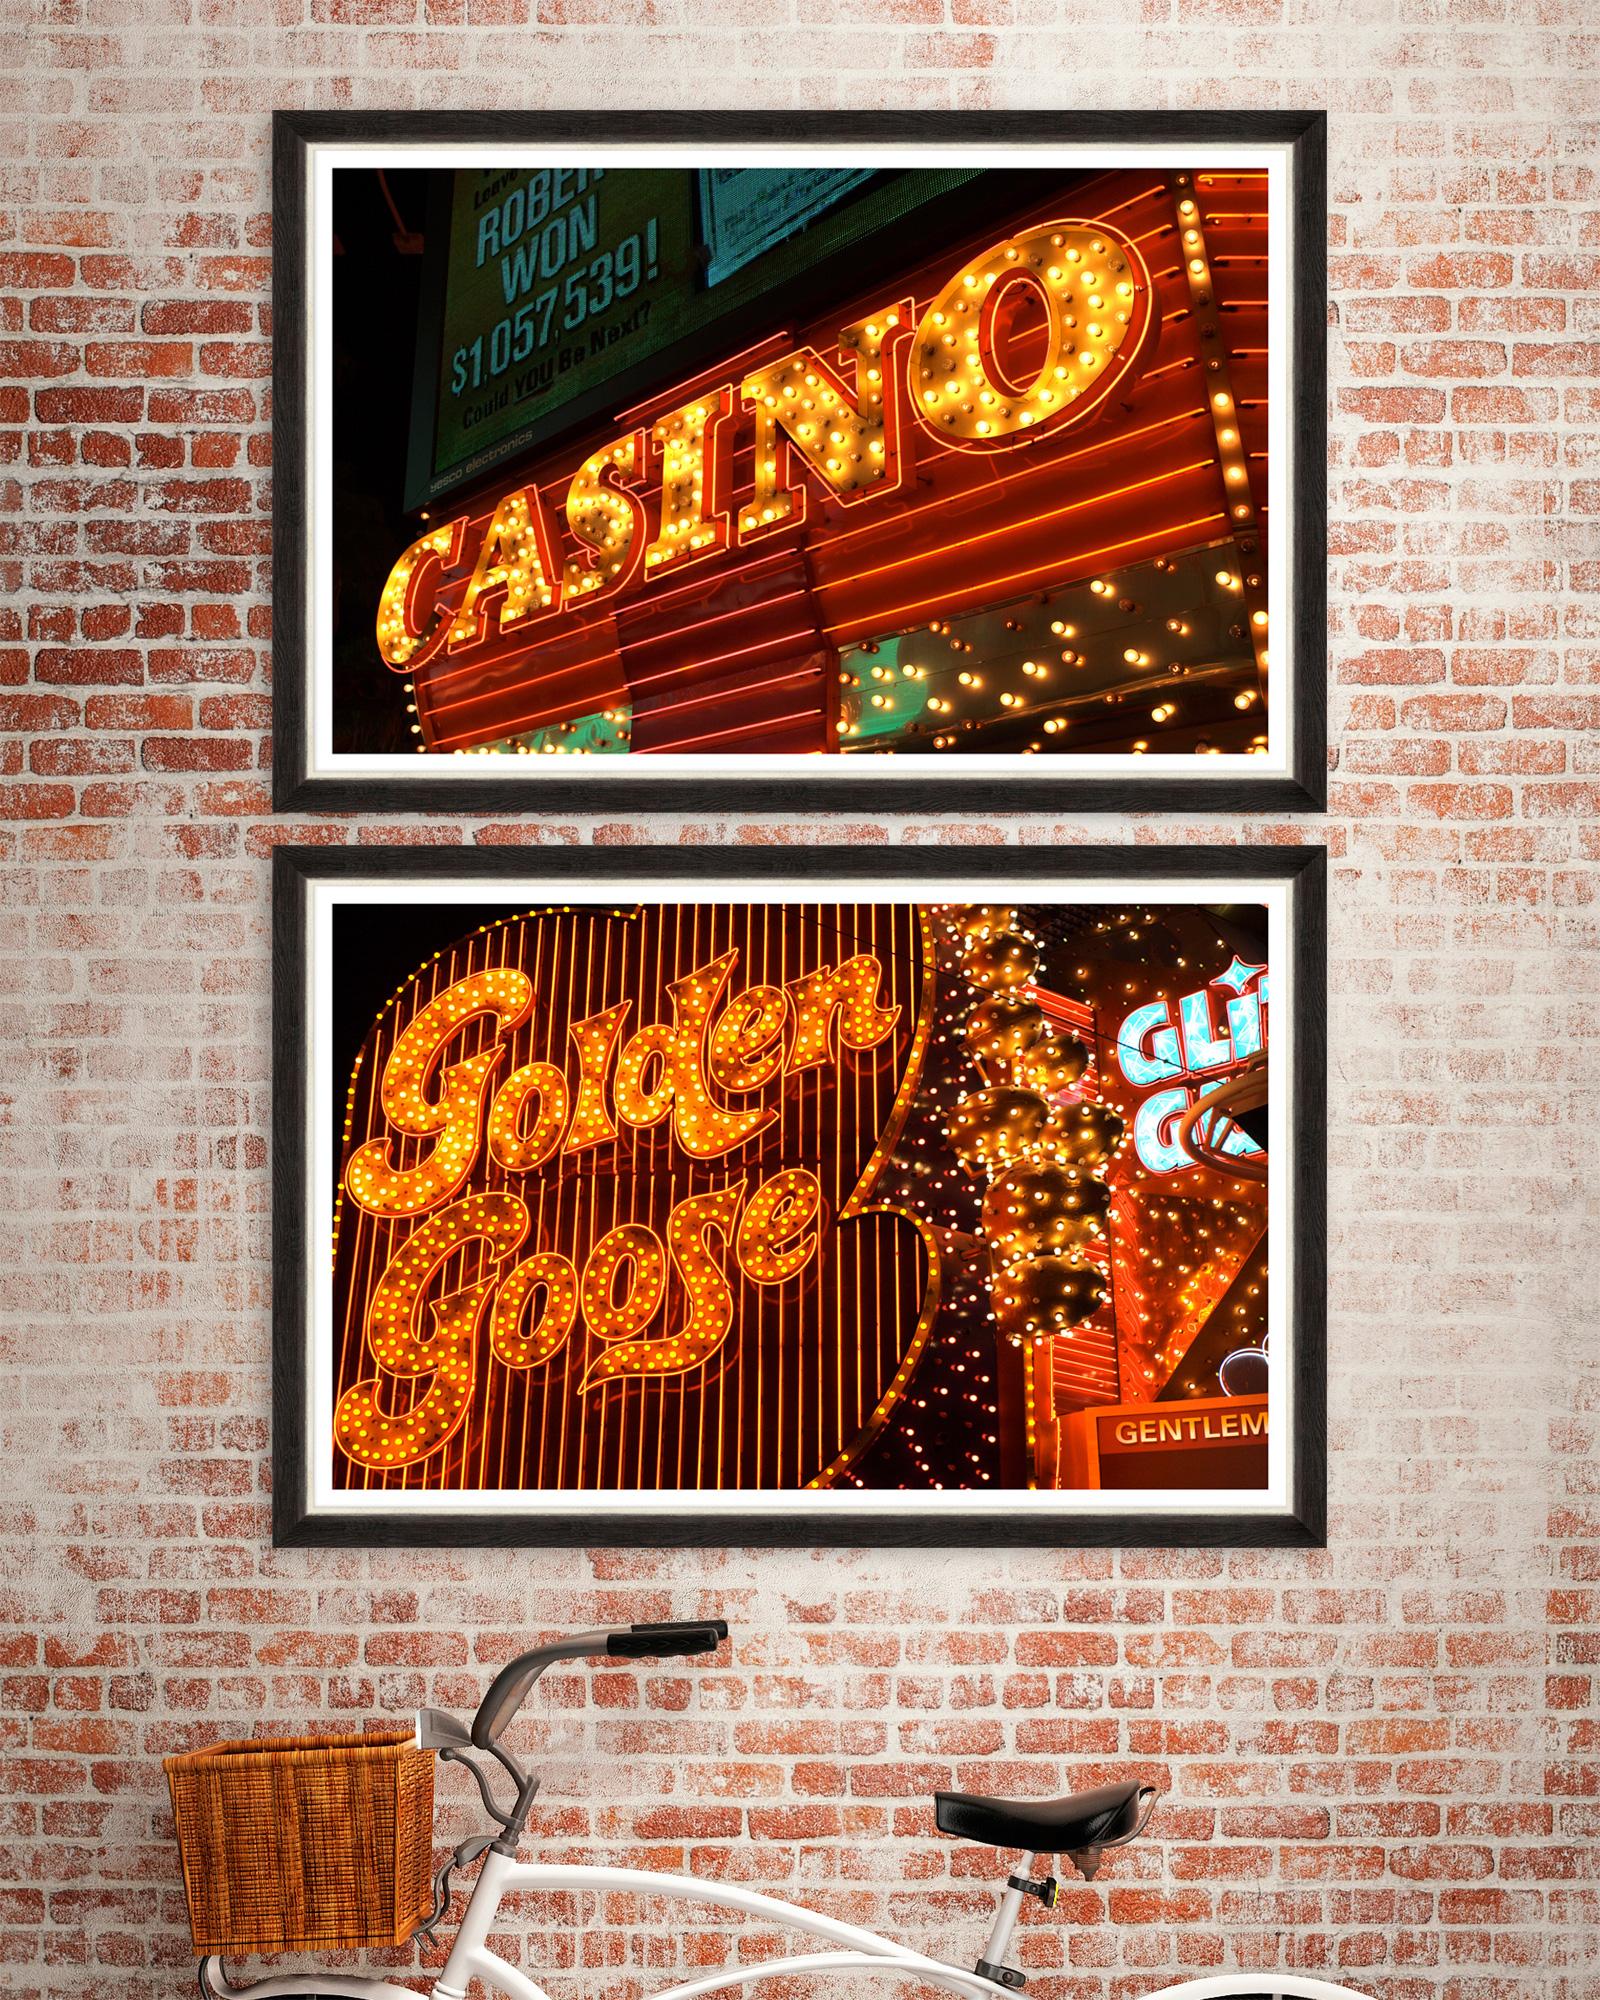 Tablou 2 piese Framed Art American Casino